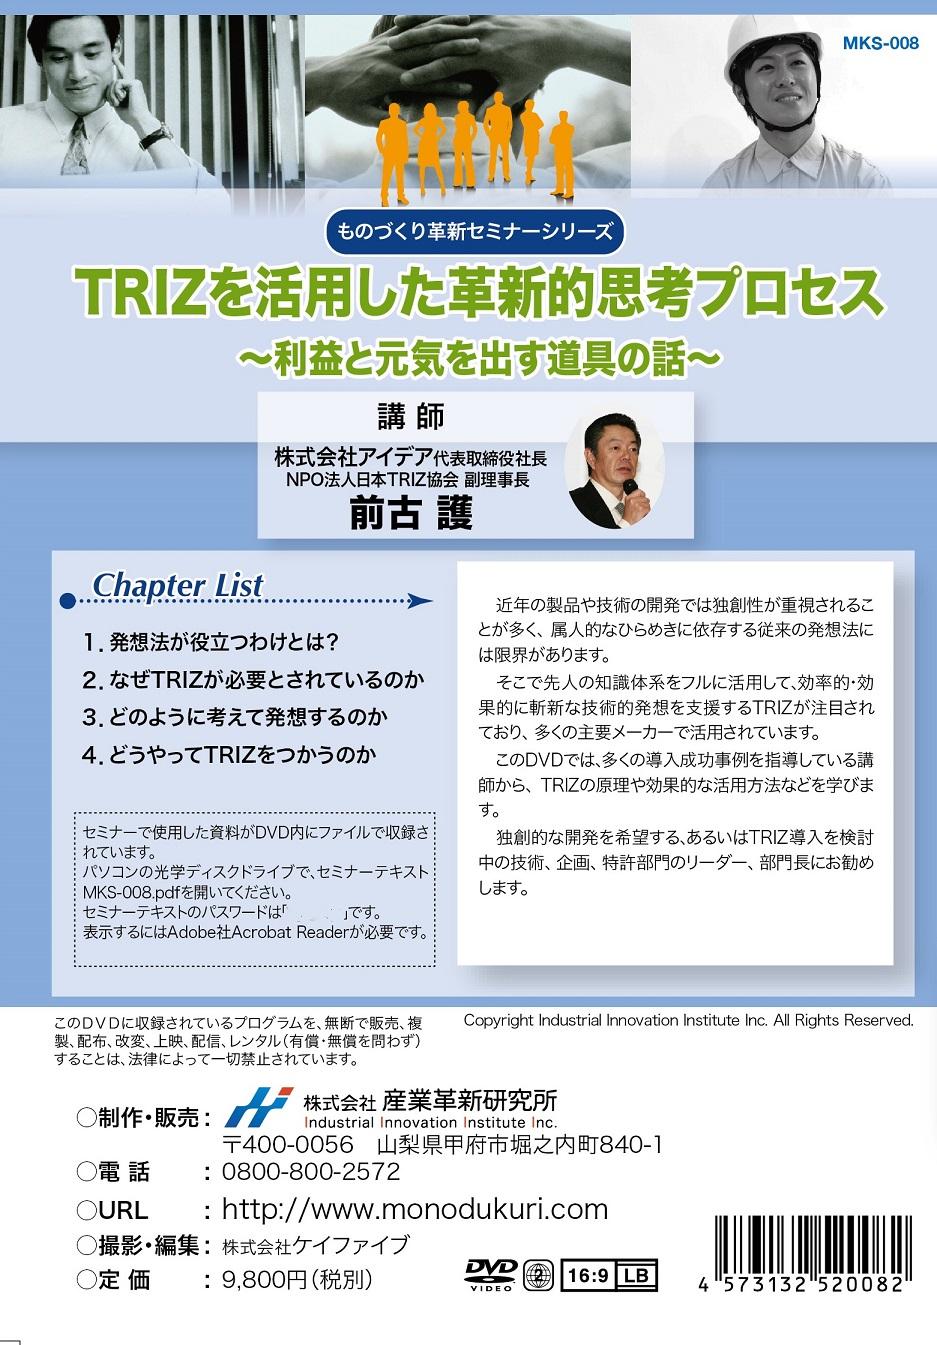 TRIZを活用した革新的思考プロセス - サンプル2